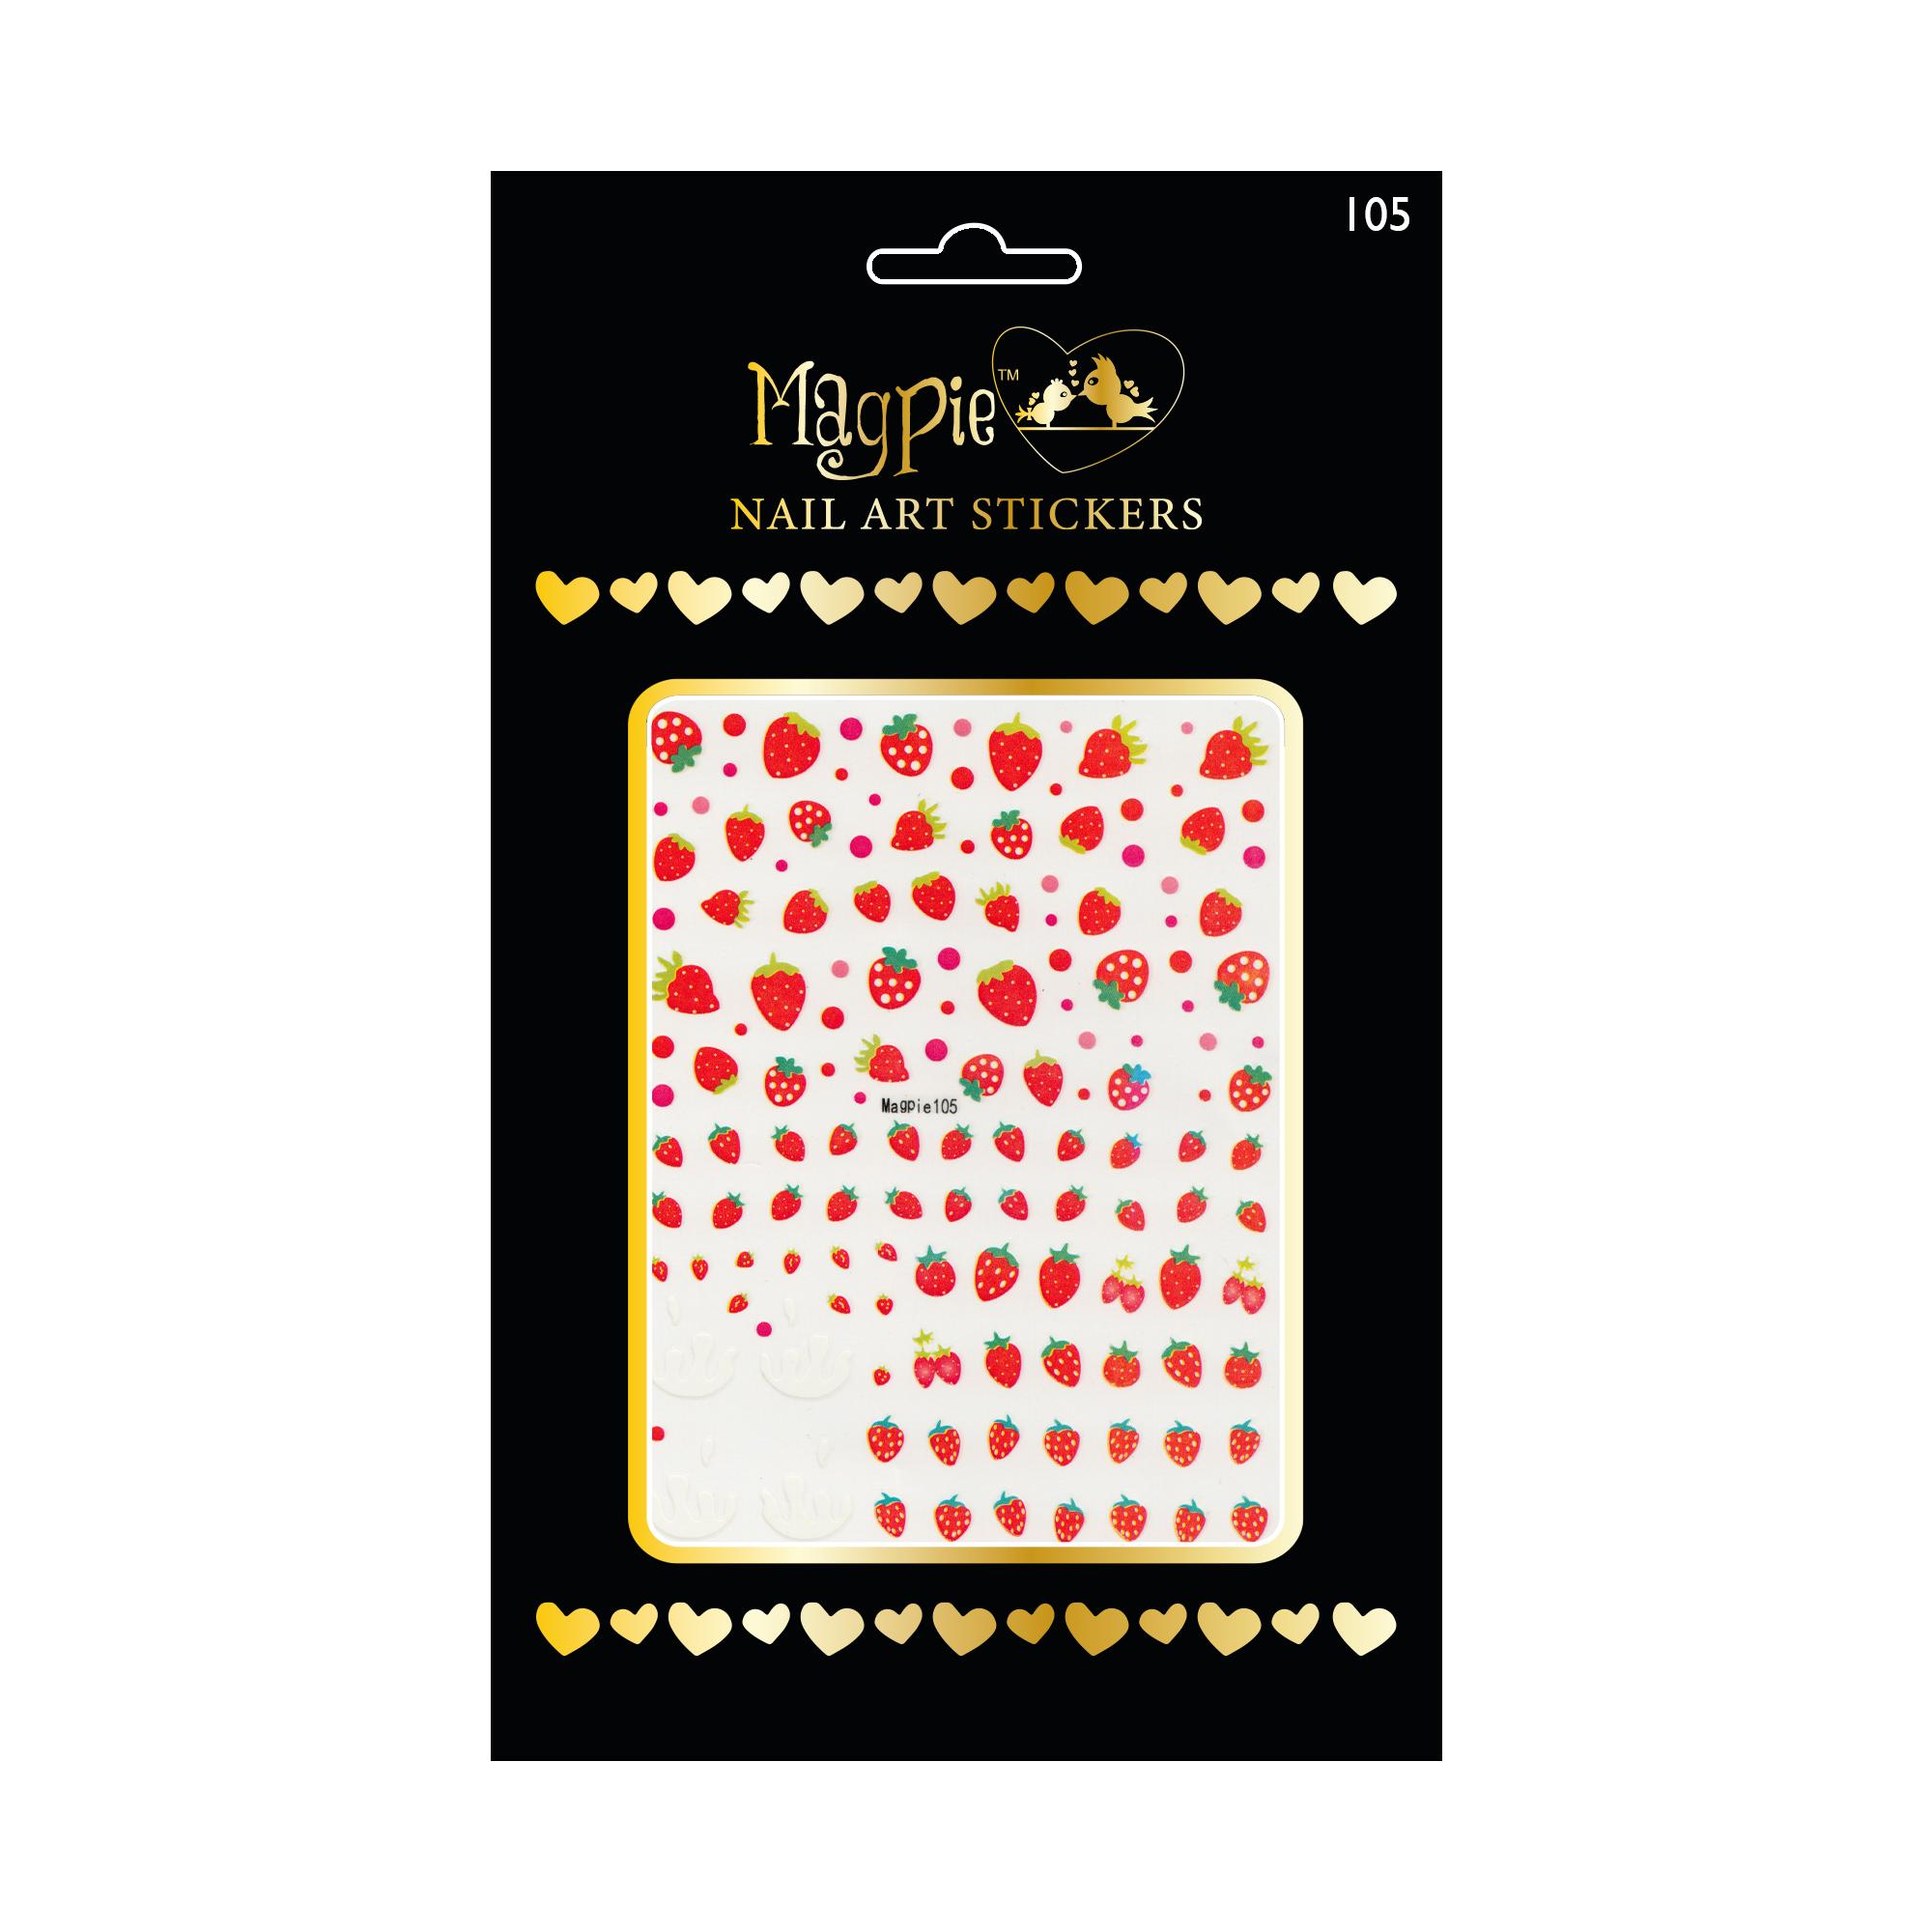 Magpie 105 stickers